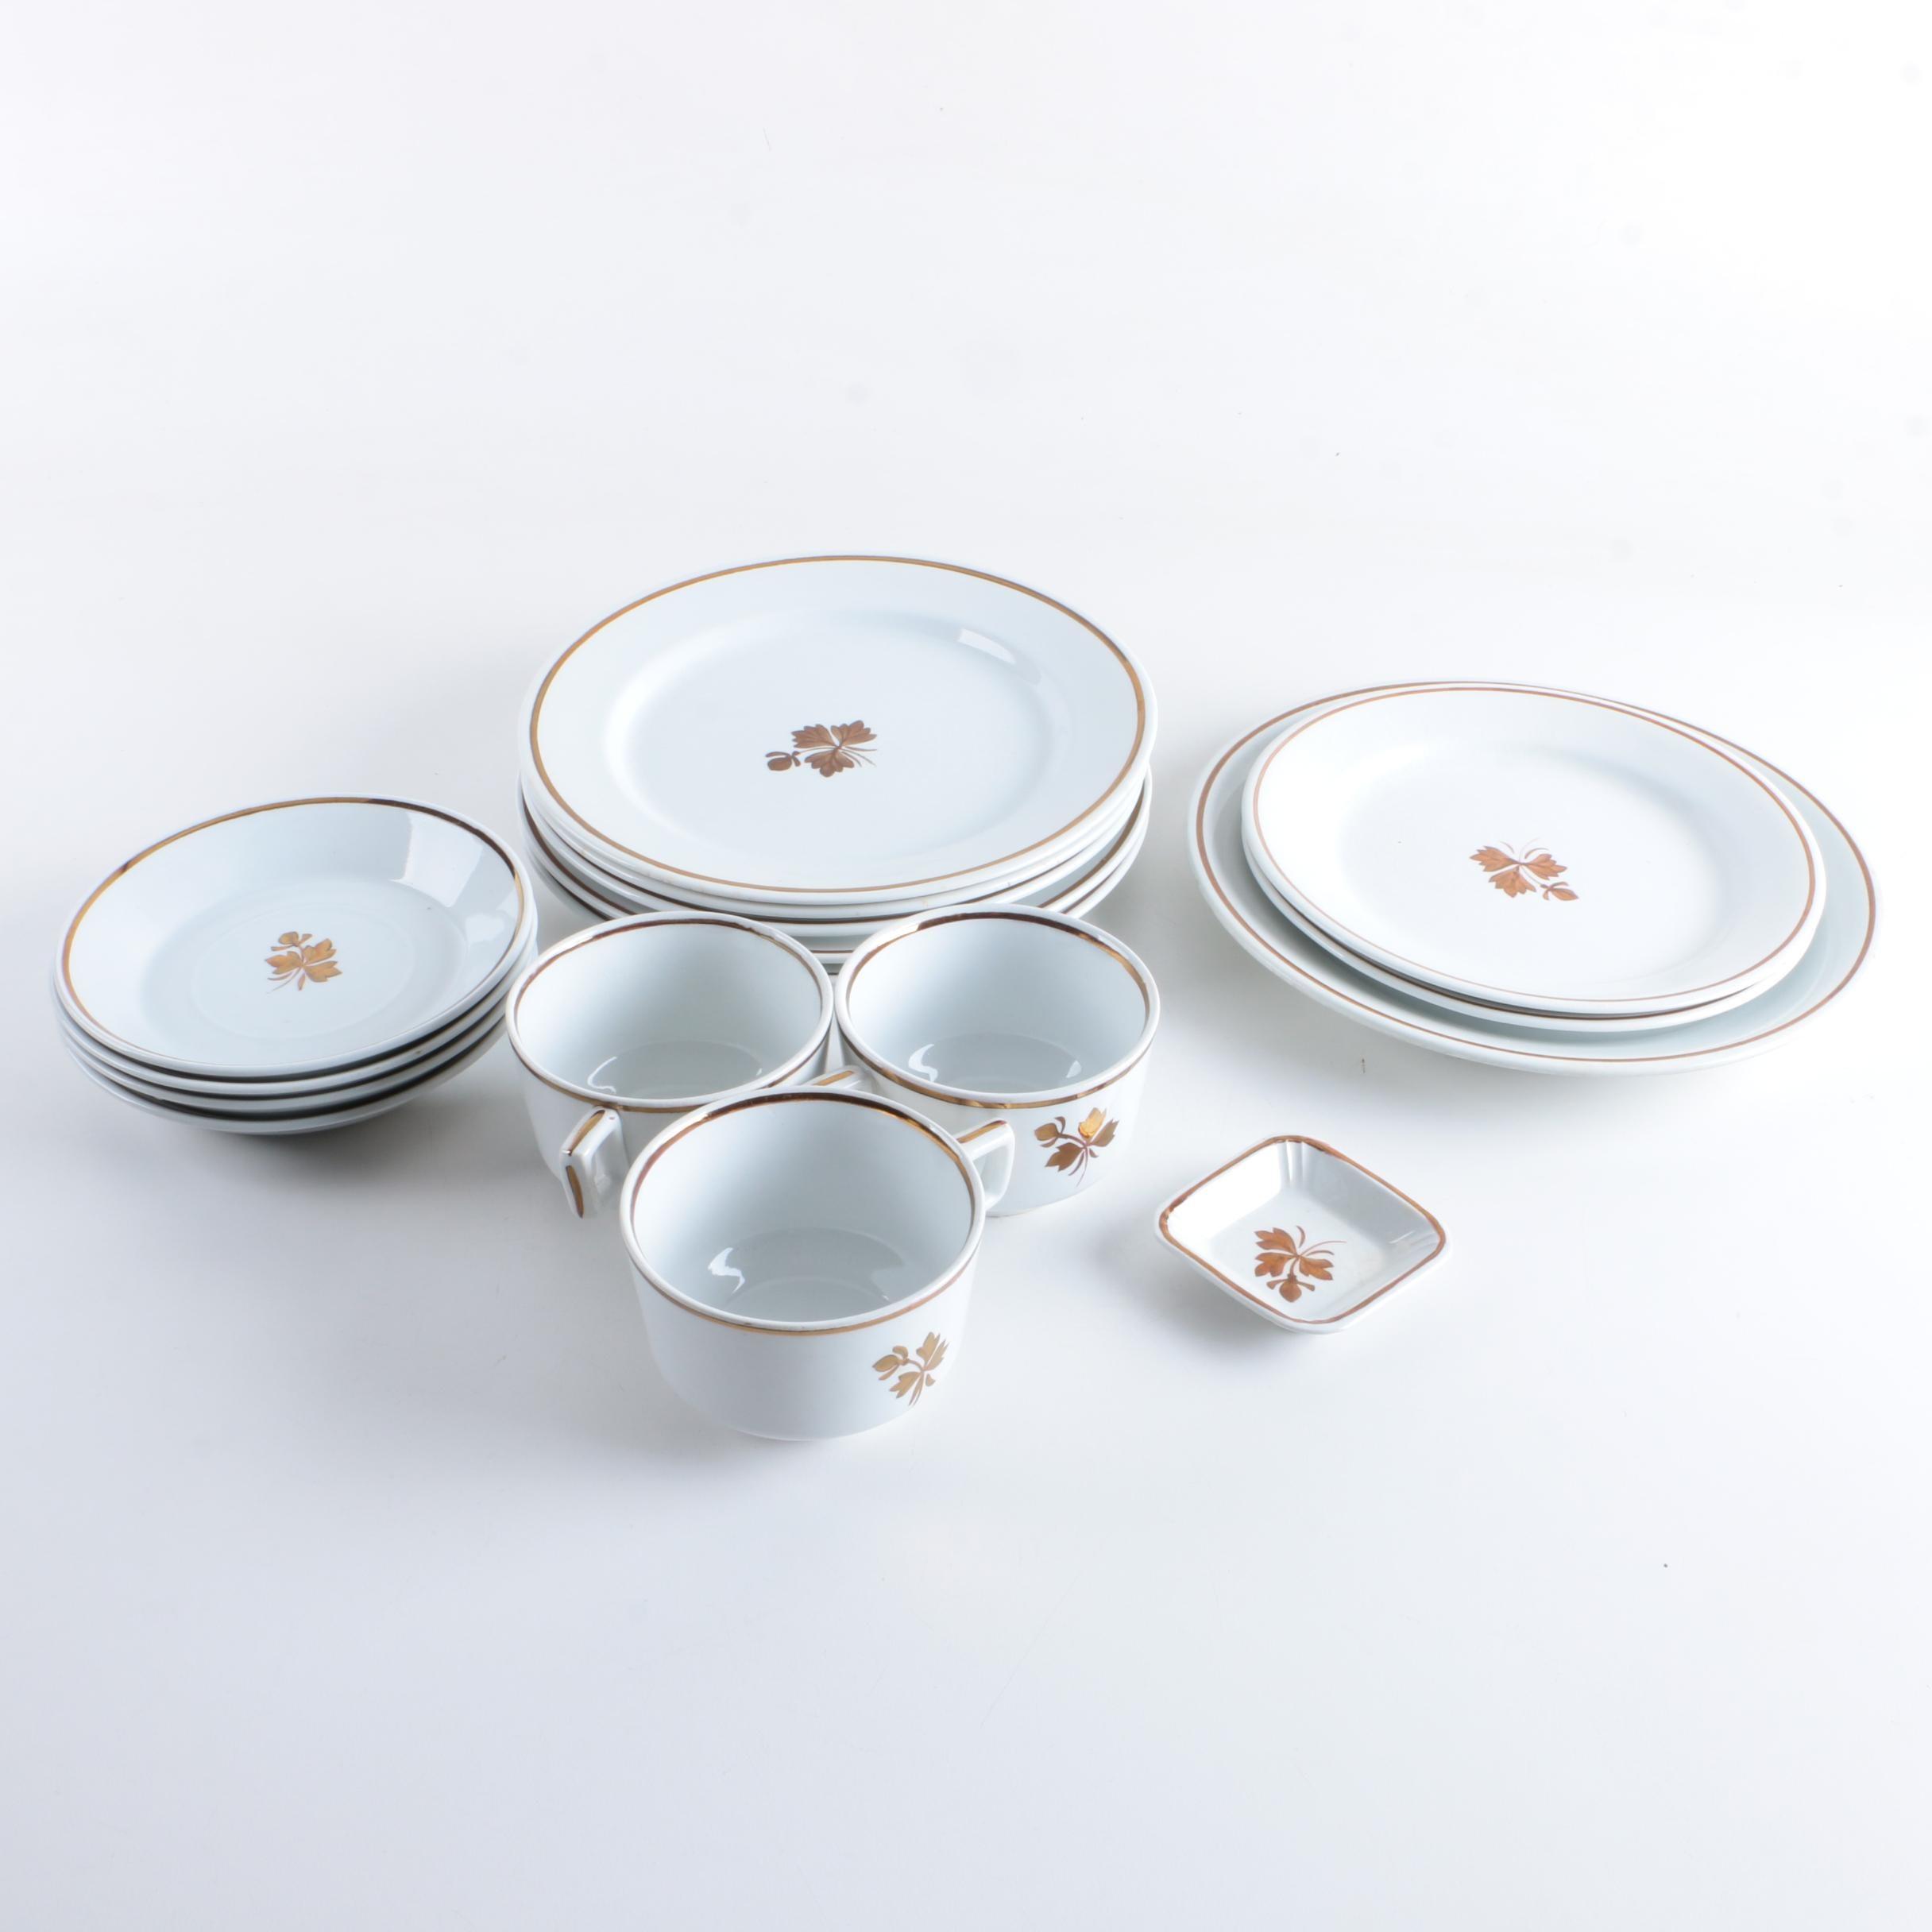 Alfred Meakin Royal Ironstone Tableware